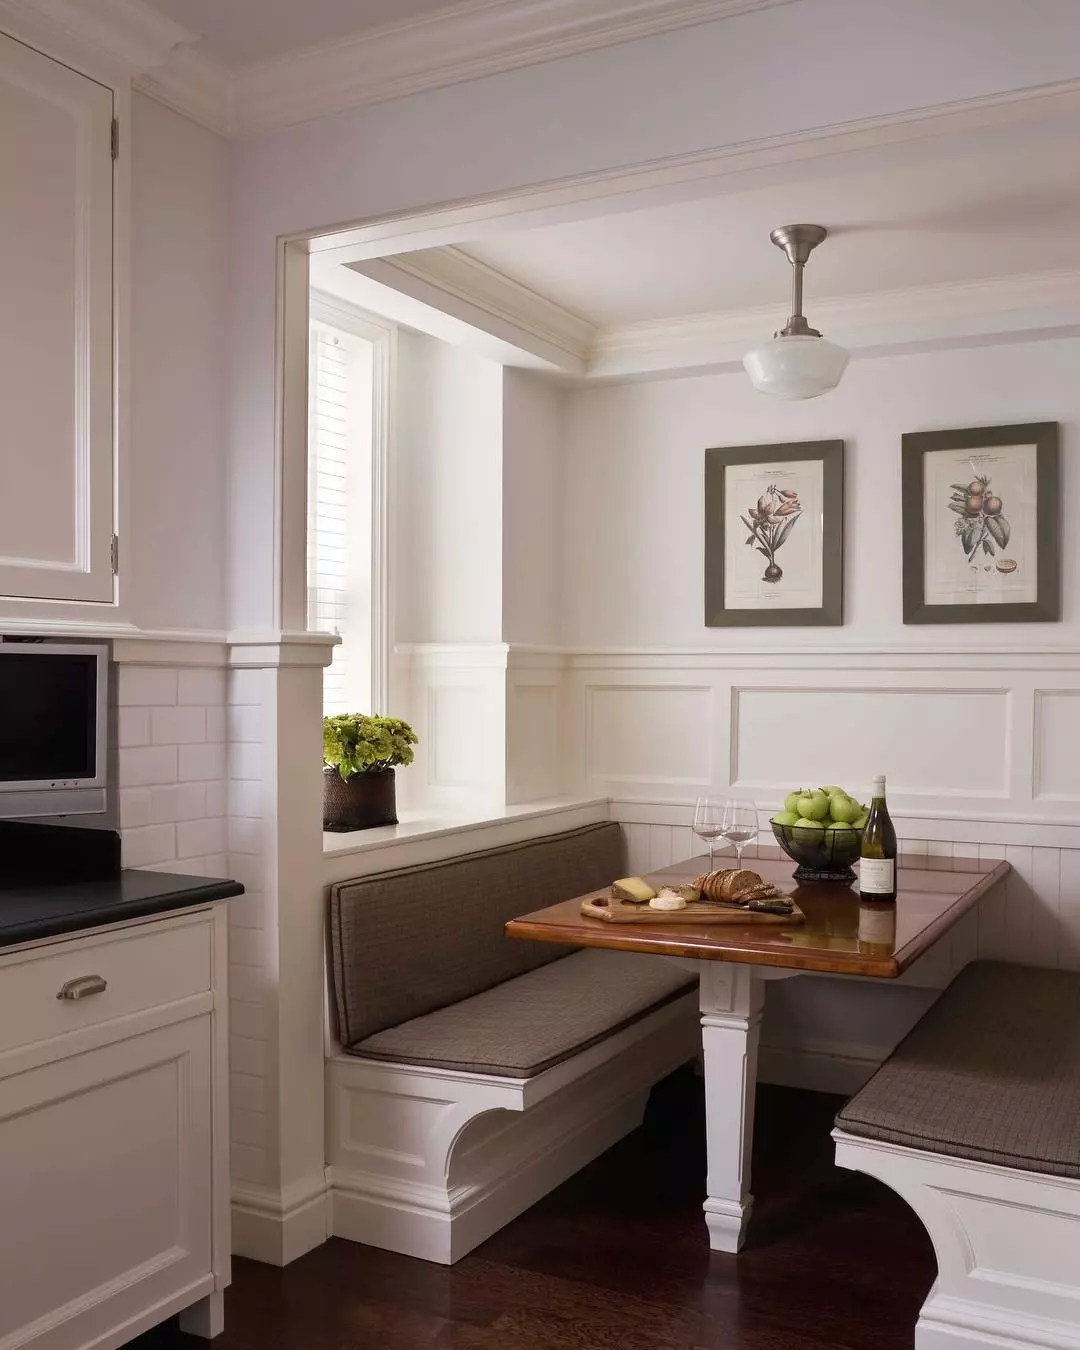 Kitchen with breakfast nook. Photo by Instagram user @jbmarchitect